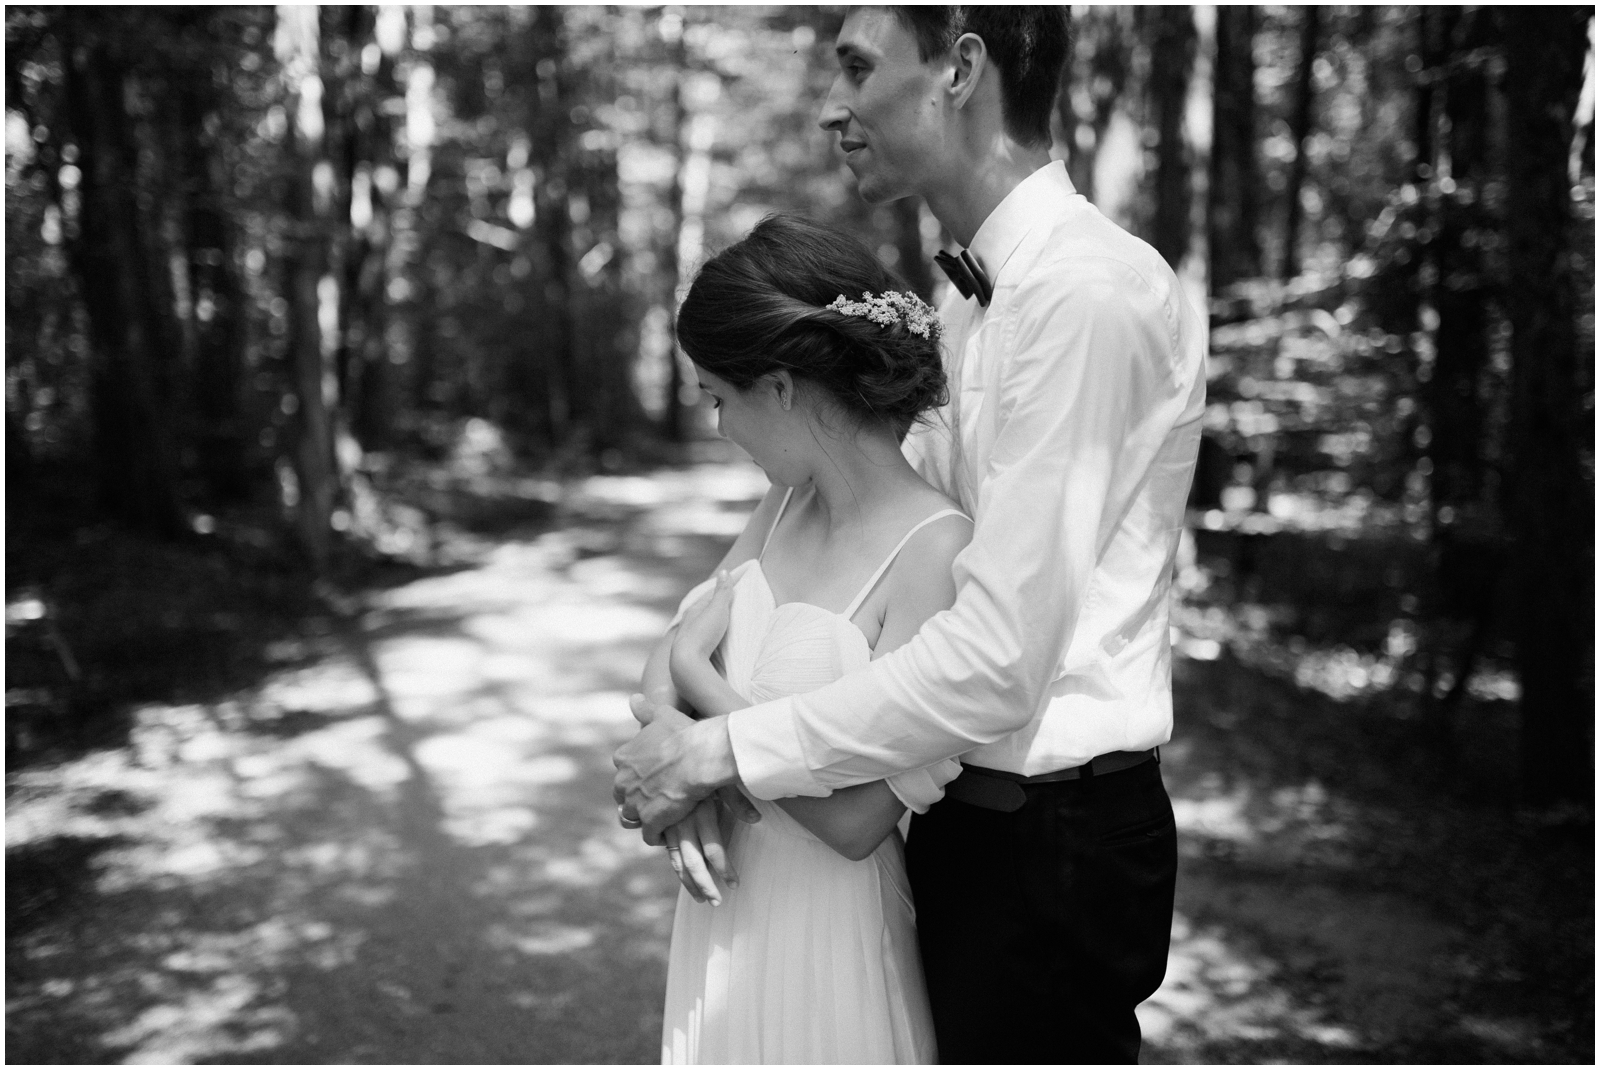 mirjam_thomas_wedding-232-2.jpg